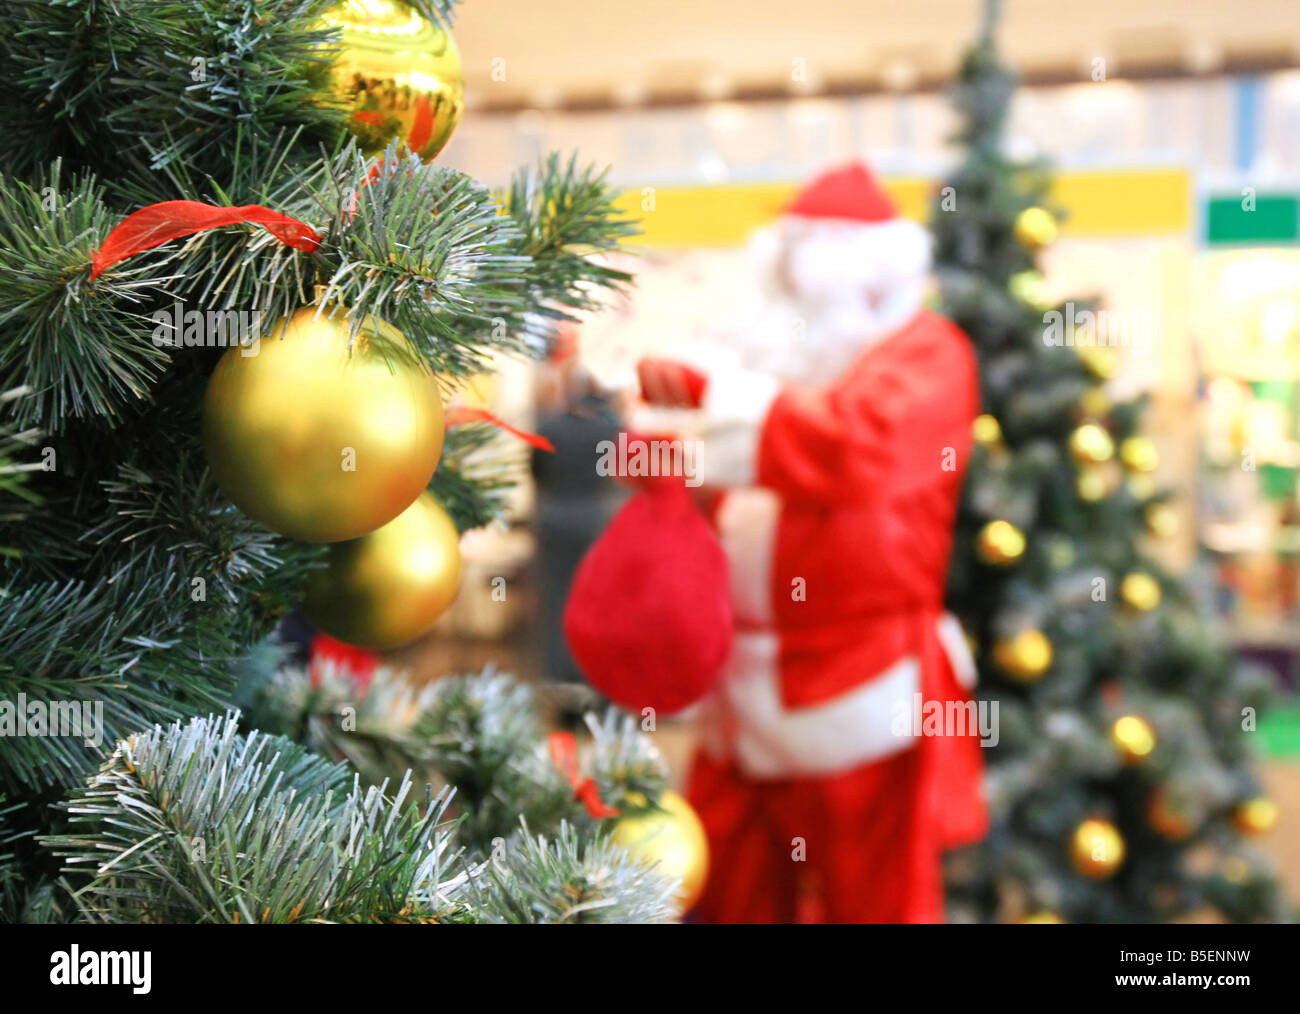 santa claus and new year tree - Stock Image